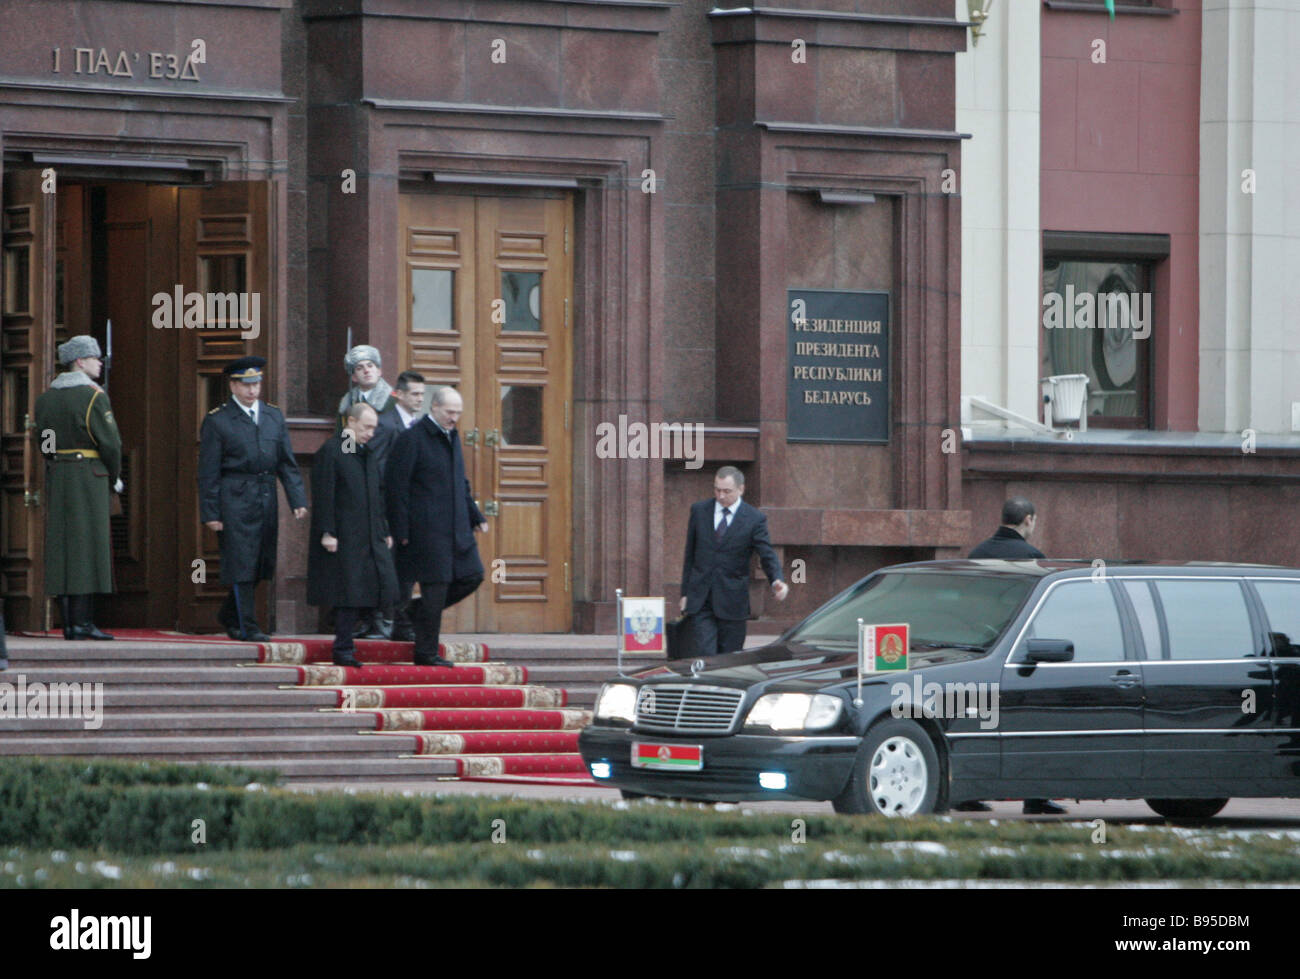 Russian President Vladimir Putin and Belarusian President Alexander Lukashenko at the Belarusian presidential administration - Stock Image